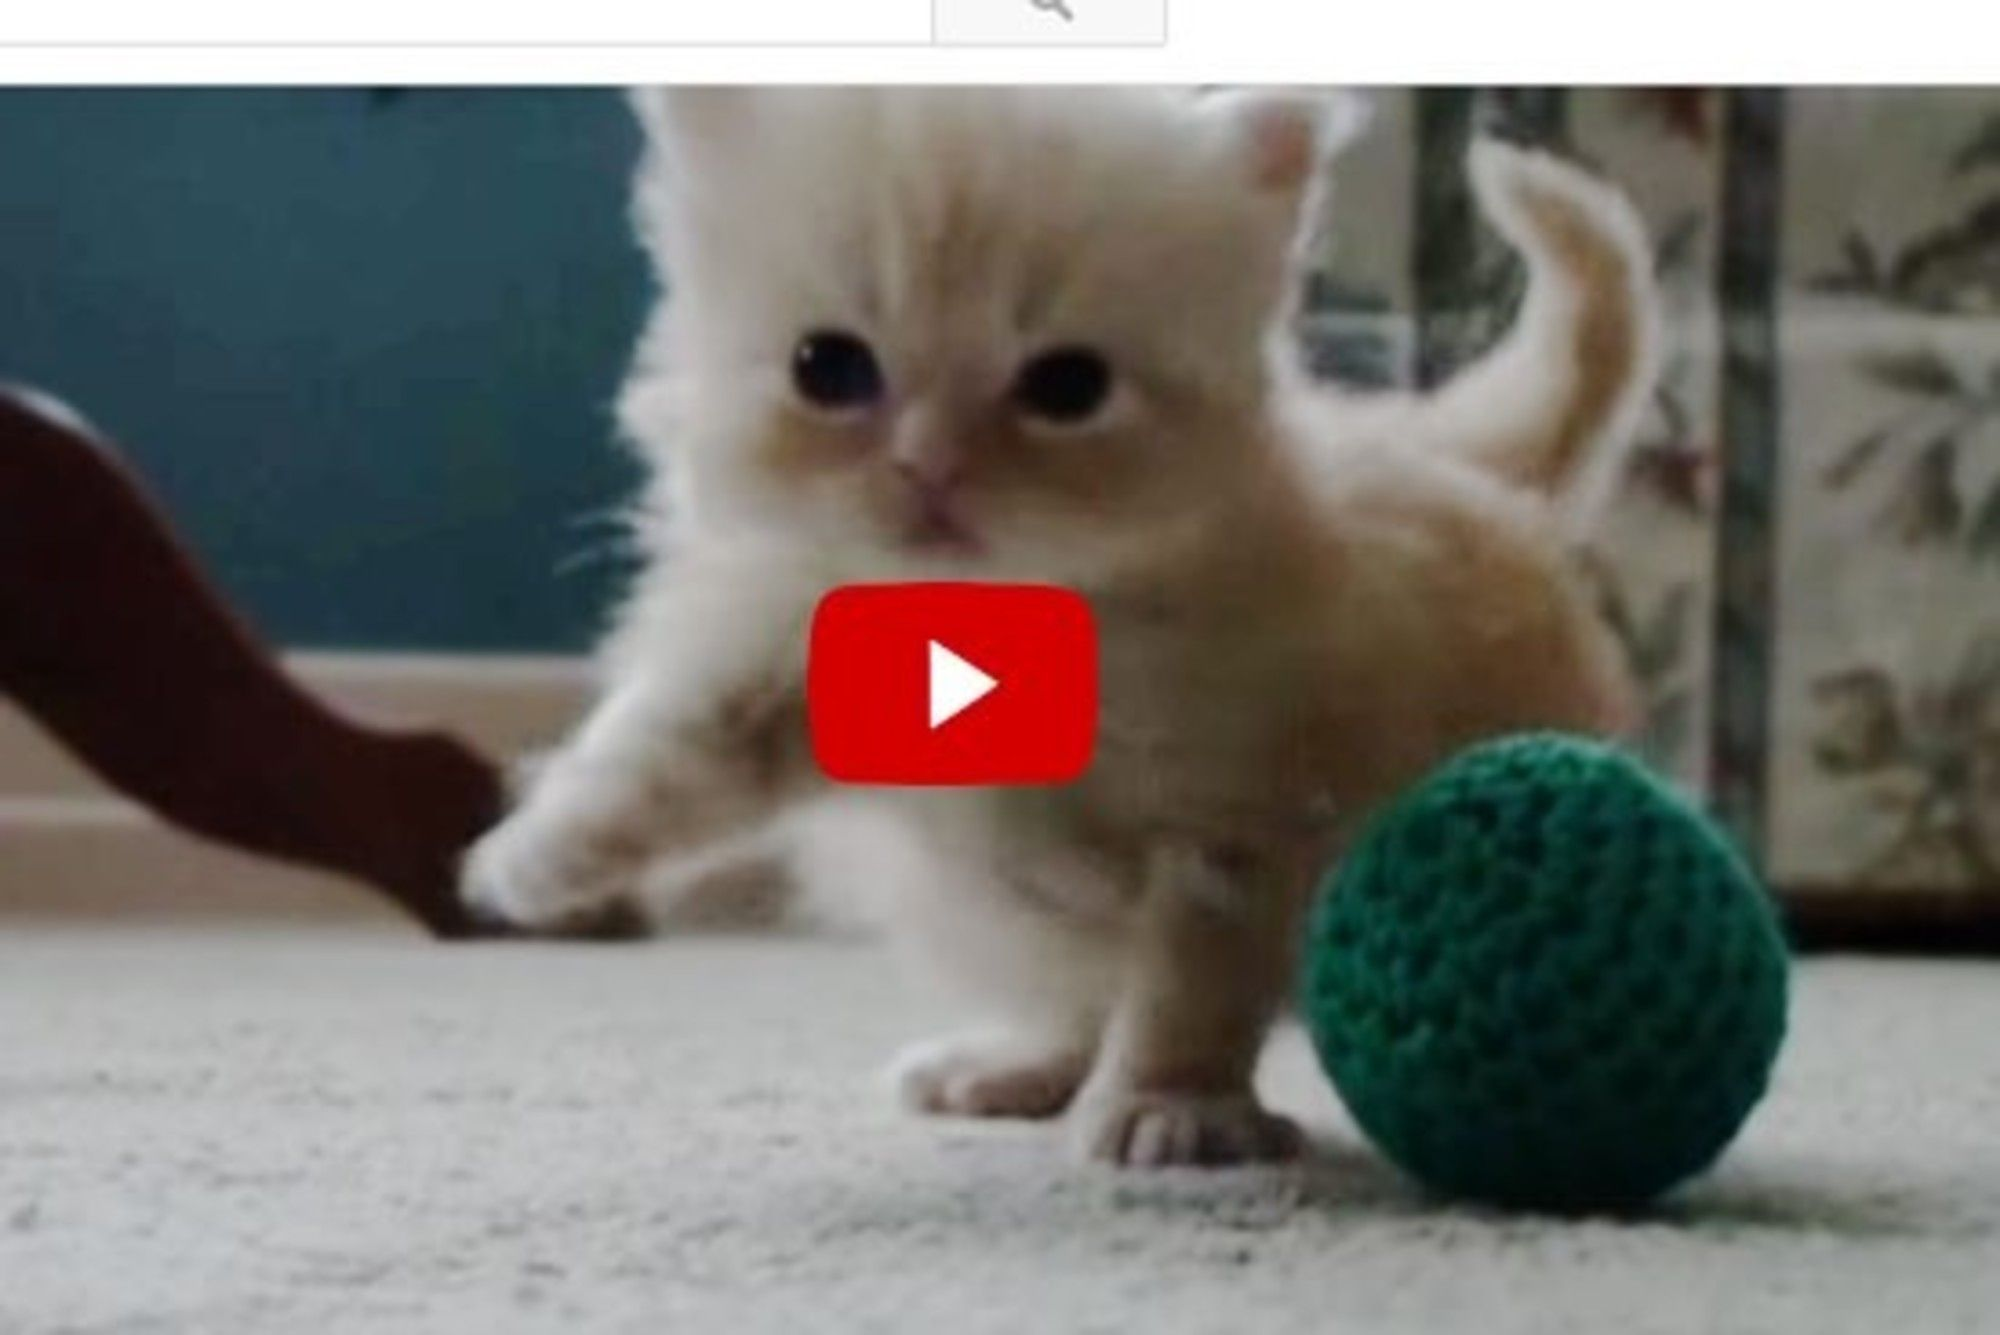 Copper The Little Ball Of Fluff Is Learning How To Walk Tiny Kitten Kitten Cat Love